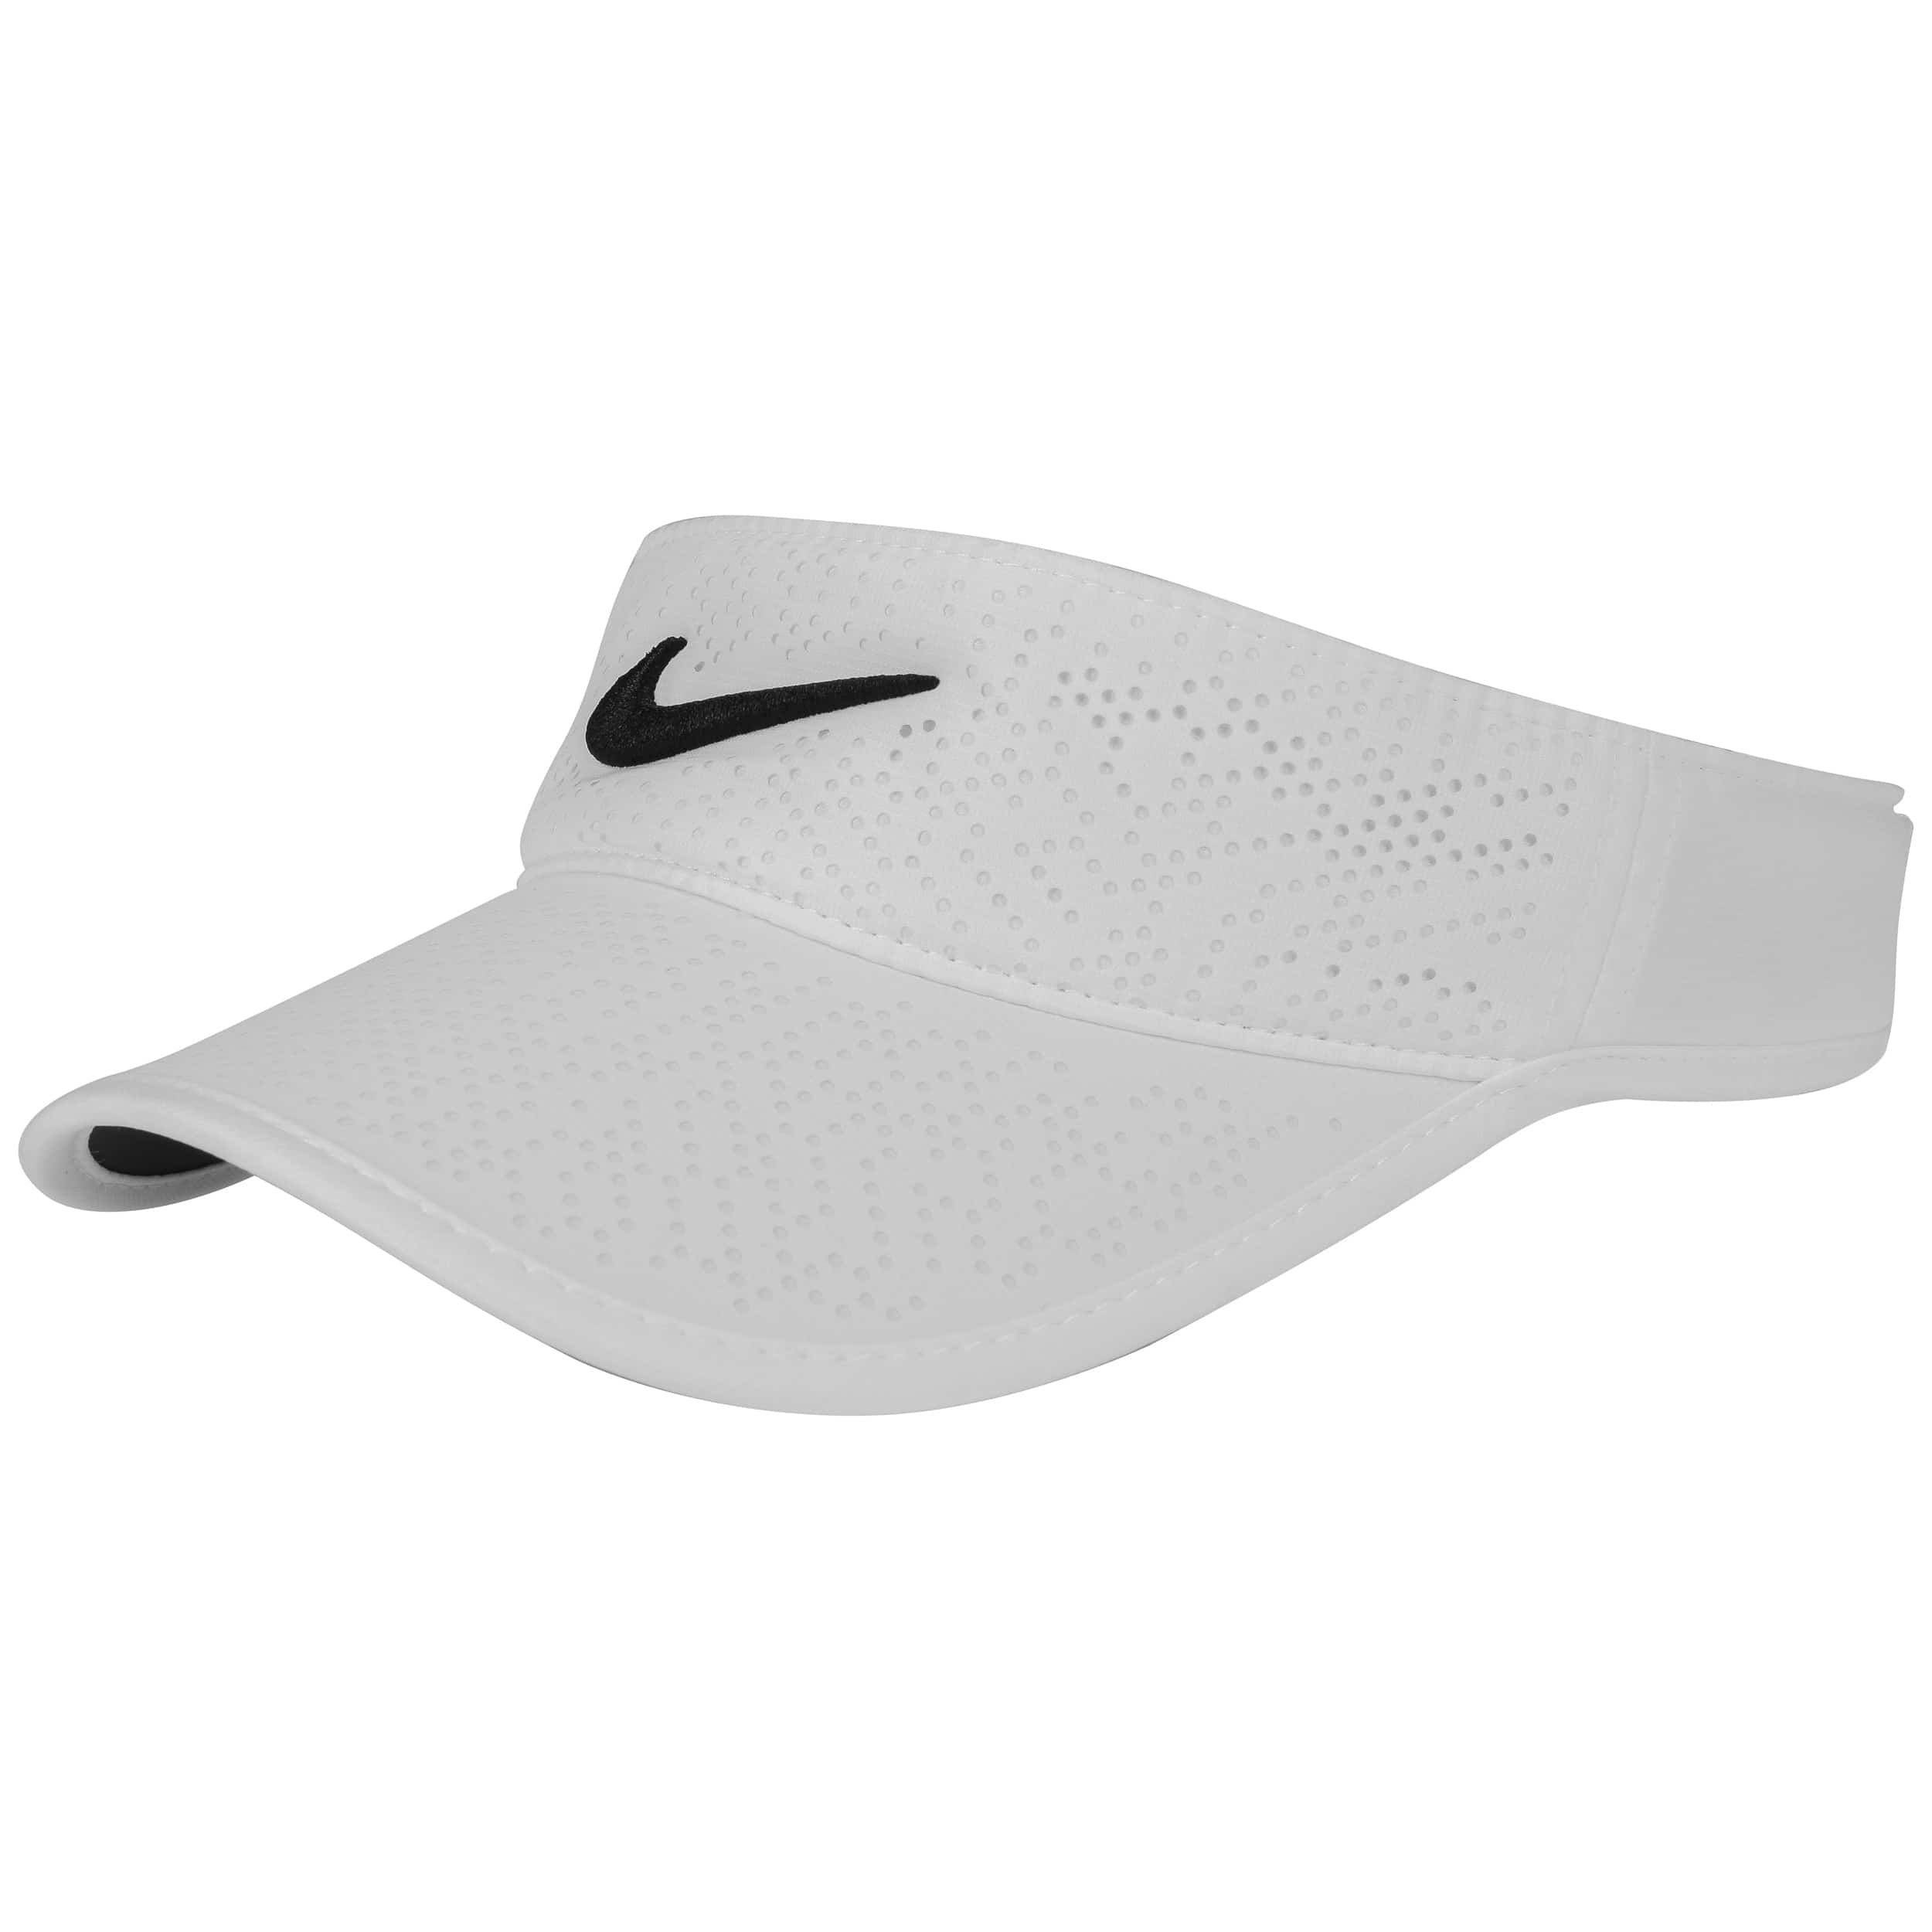 79866401d78be Visera Tech Dri-FitVisor by Nike - Gorras - sombreroshop.es